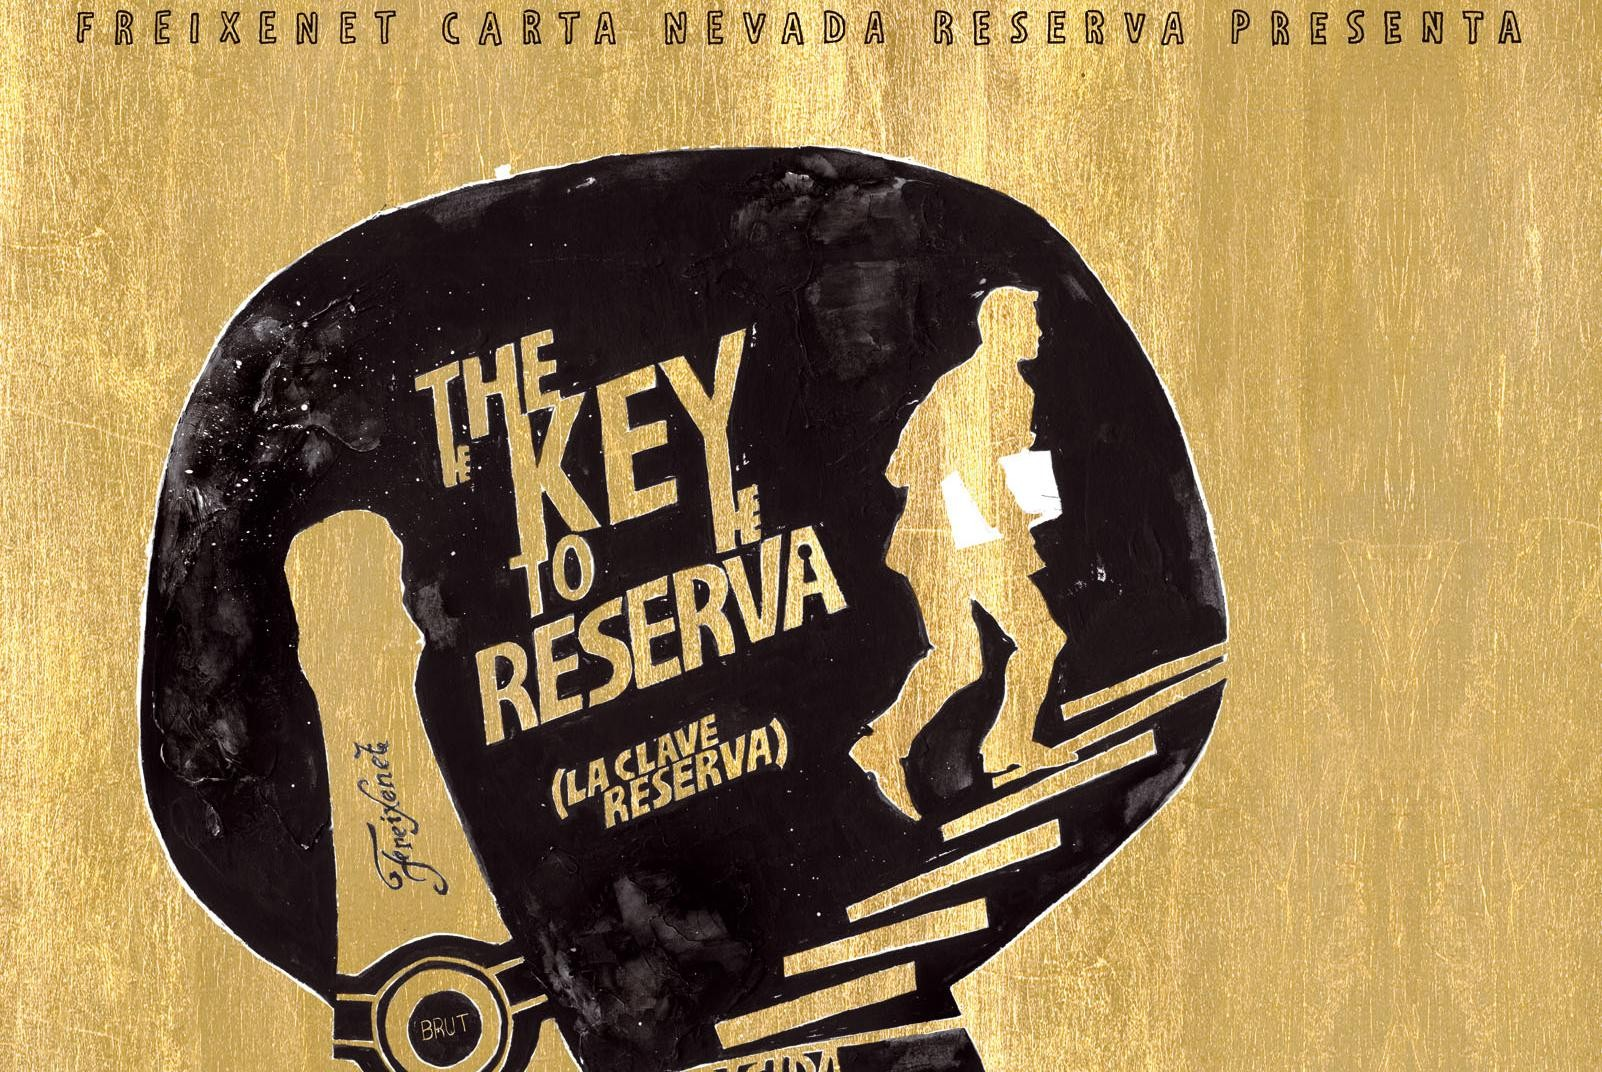 La clave reserva de Martin Scorsese para Freixenet